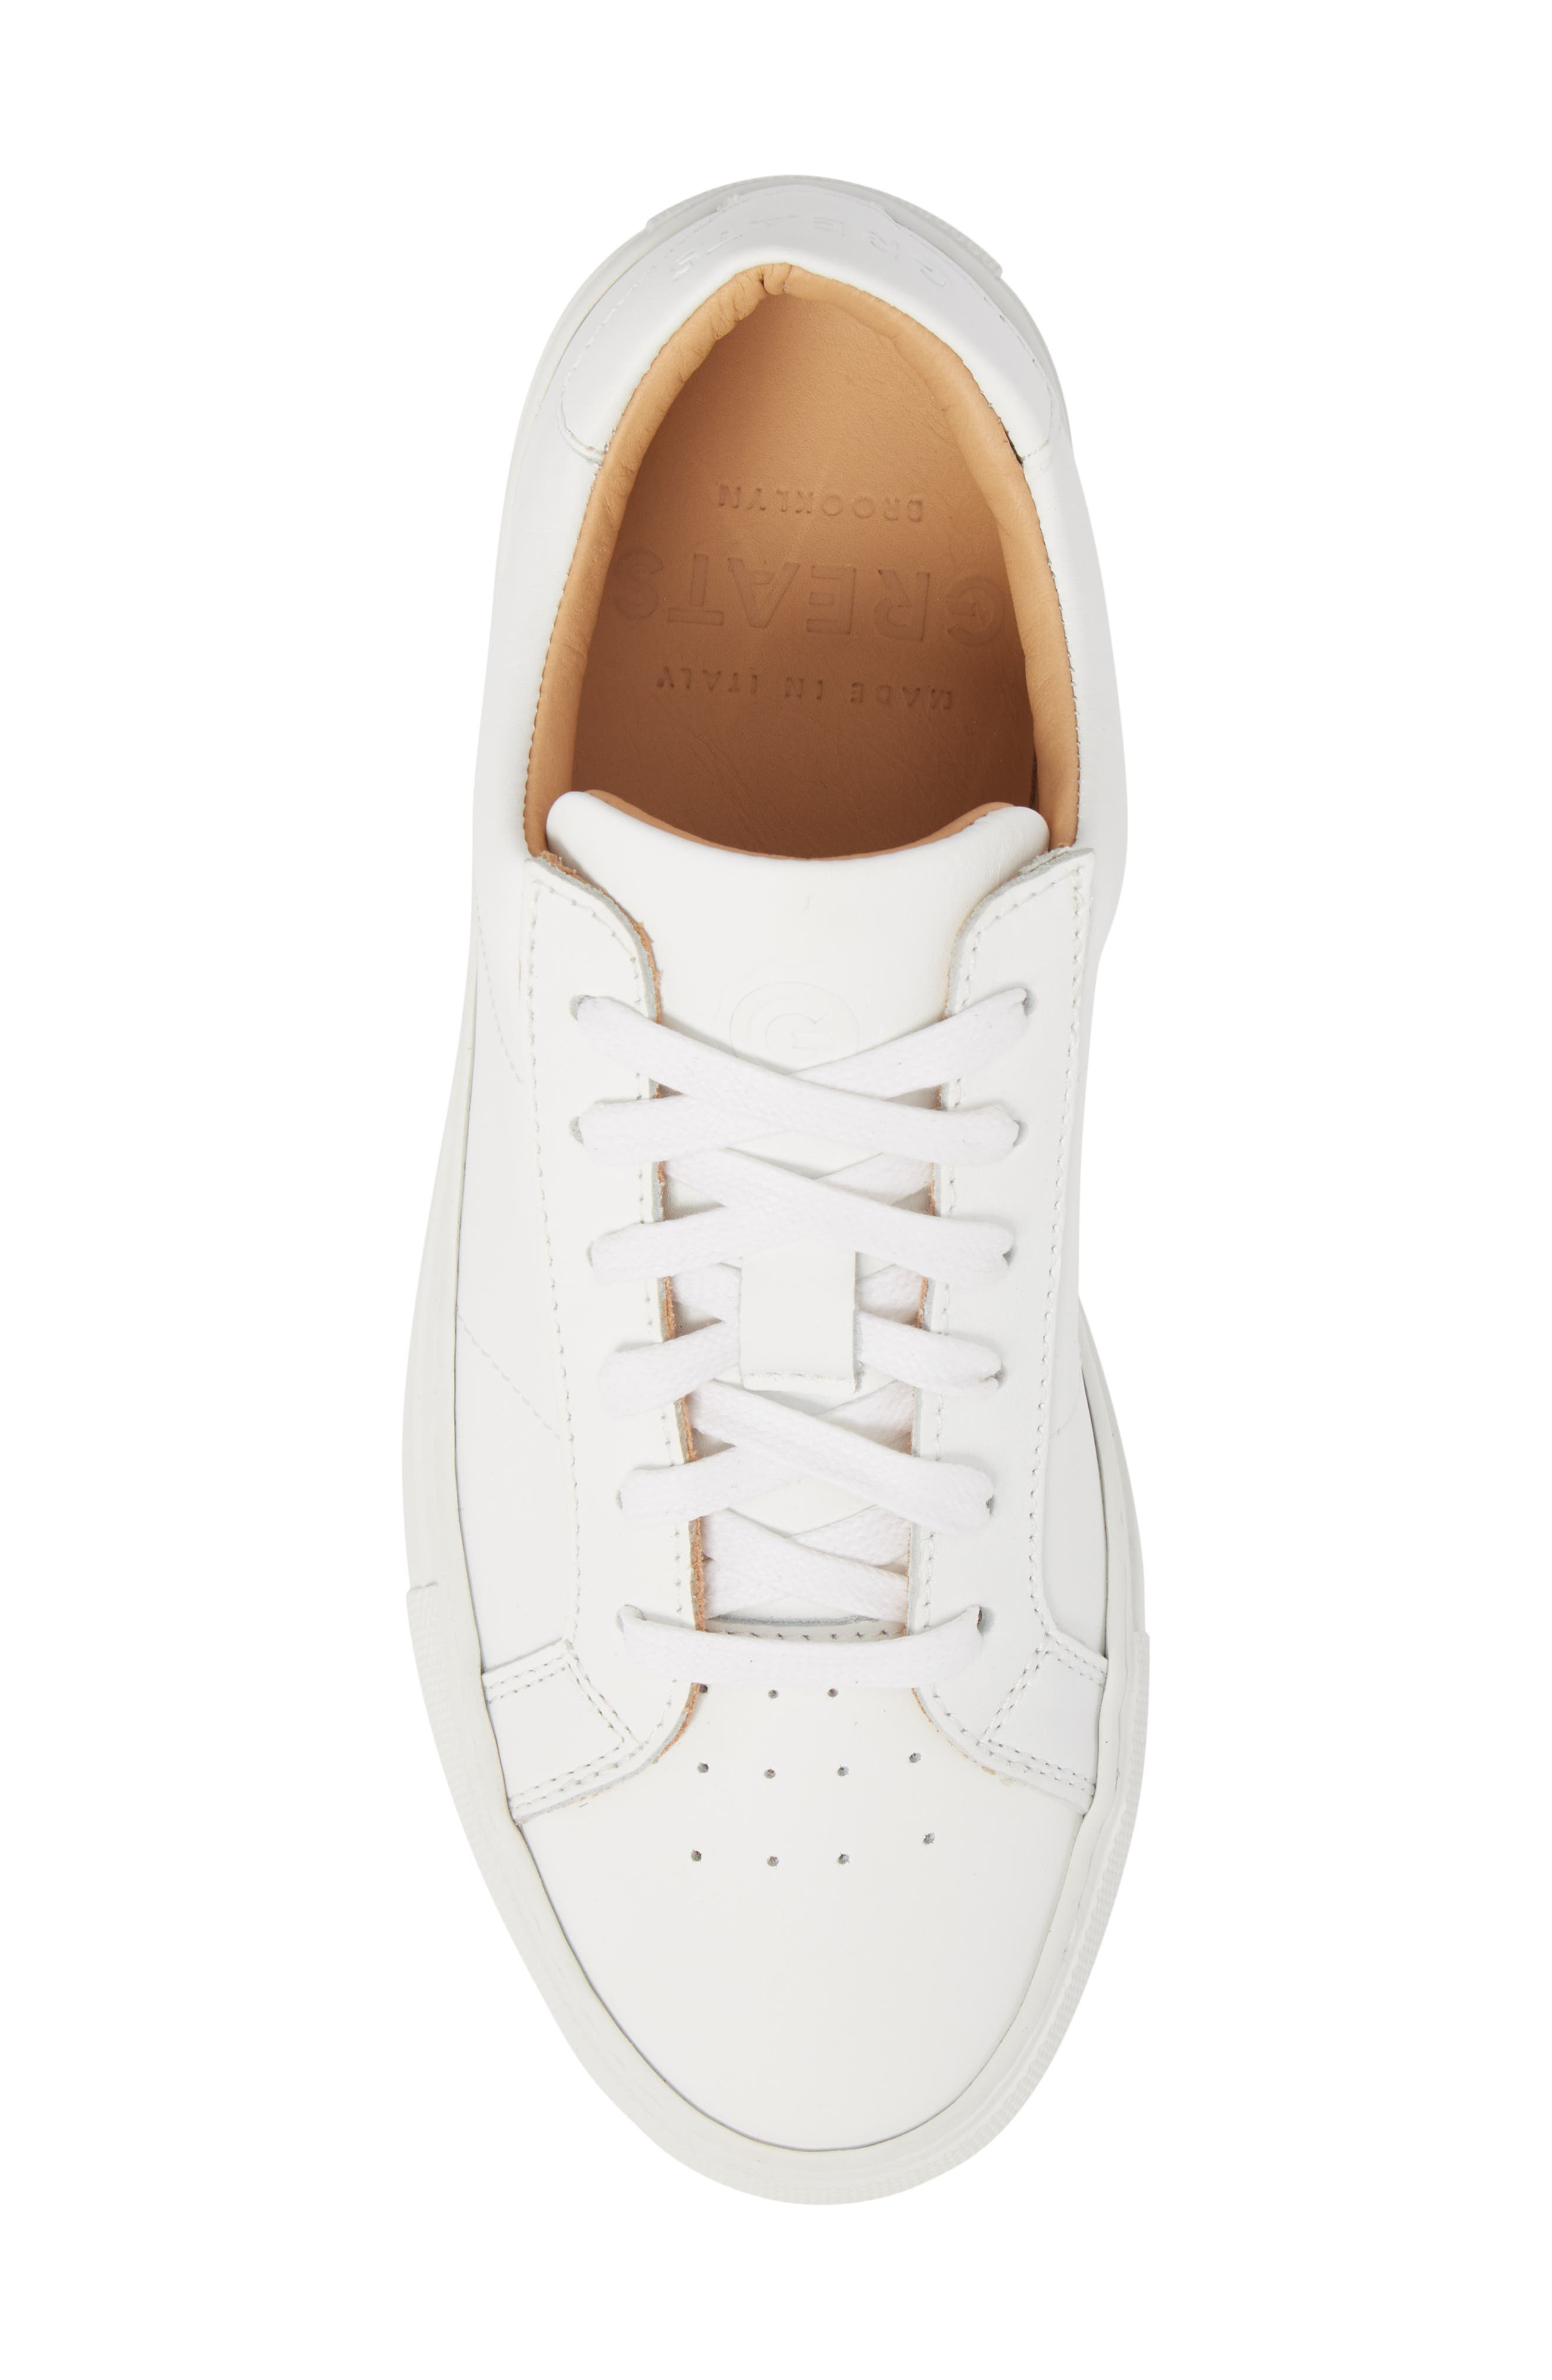 Royale Sneaker,                             Alternate thumbnail 5, color,